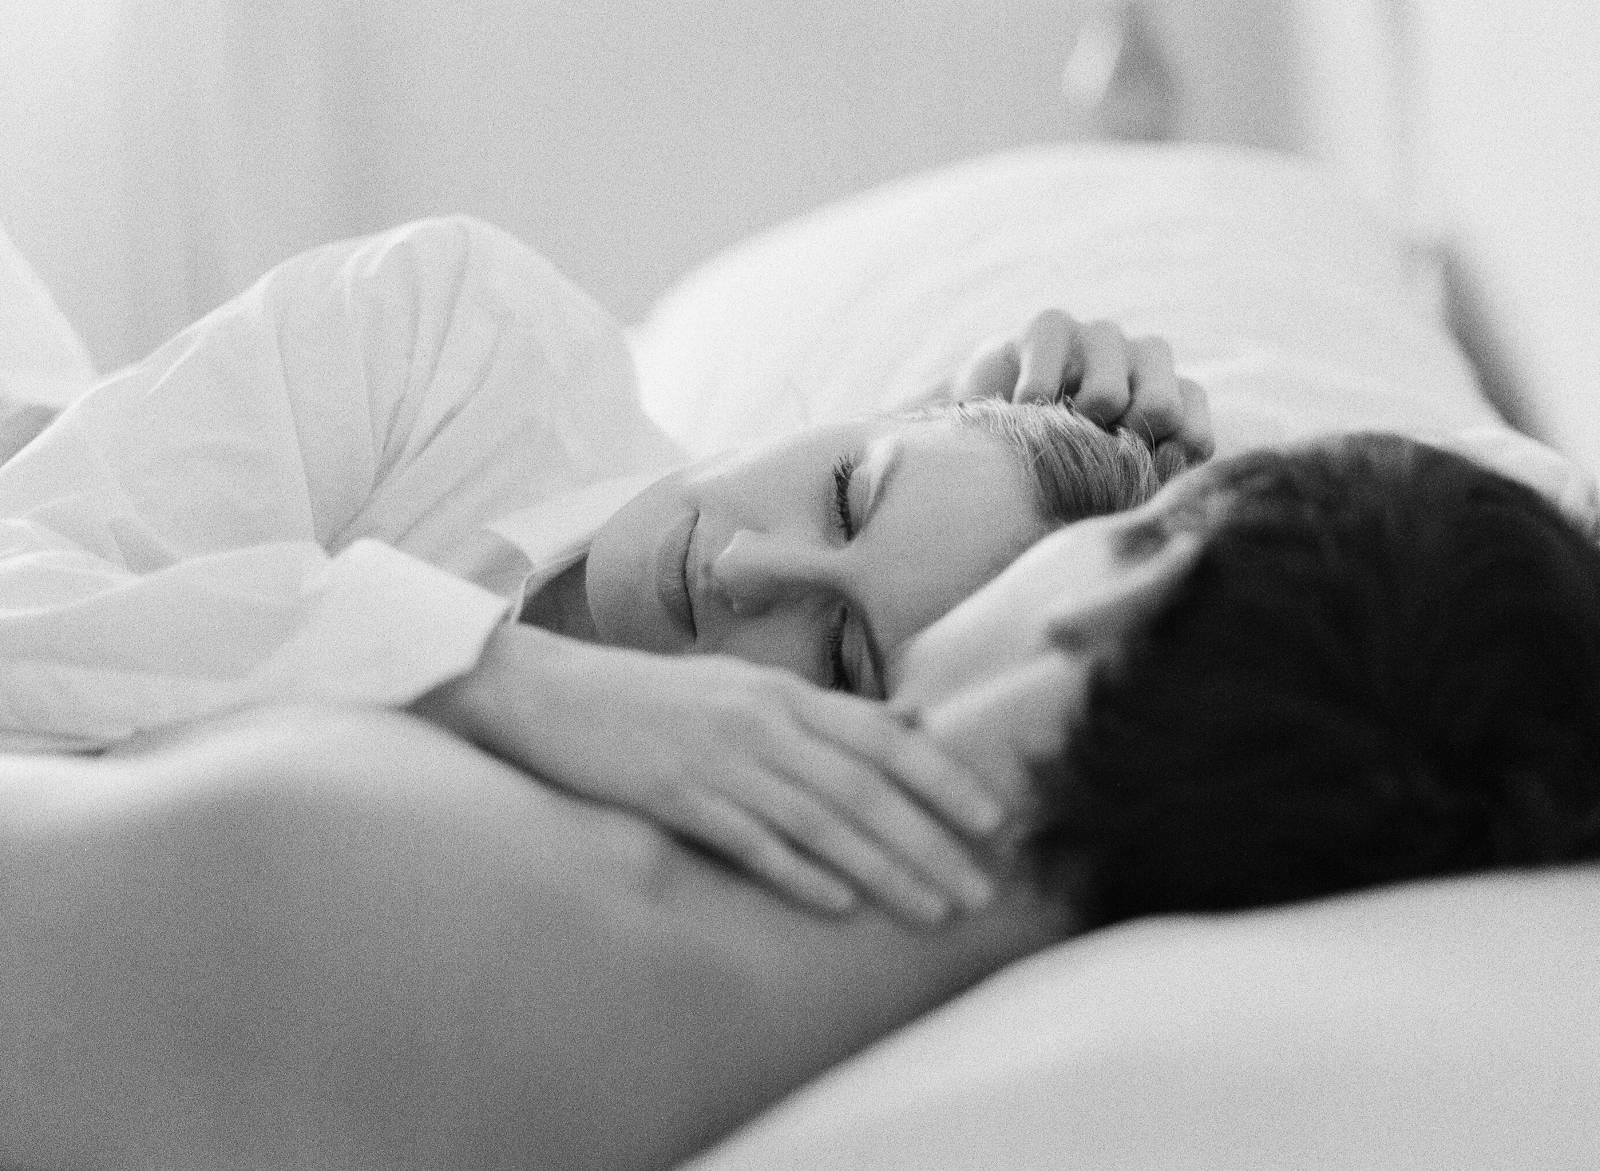 când dorm o erecție)